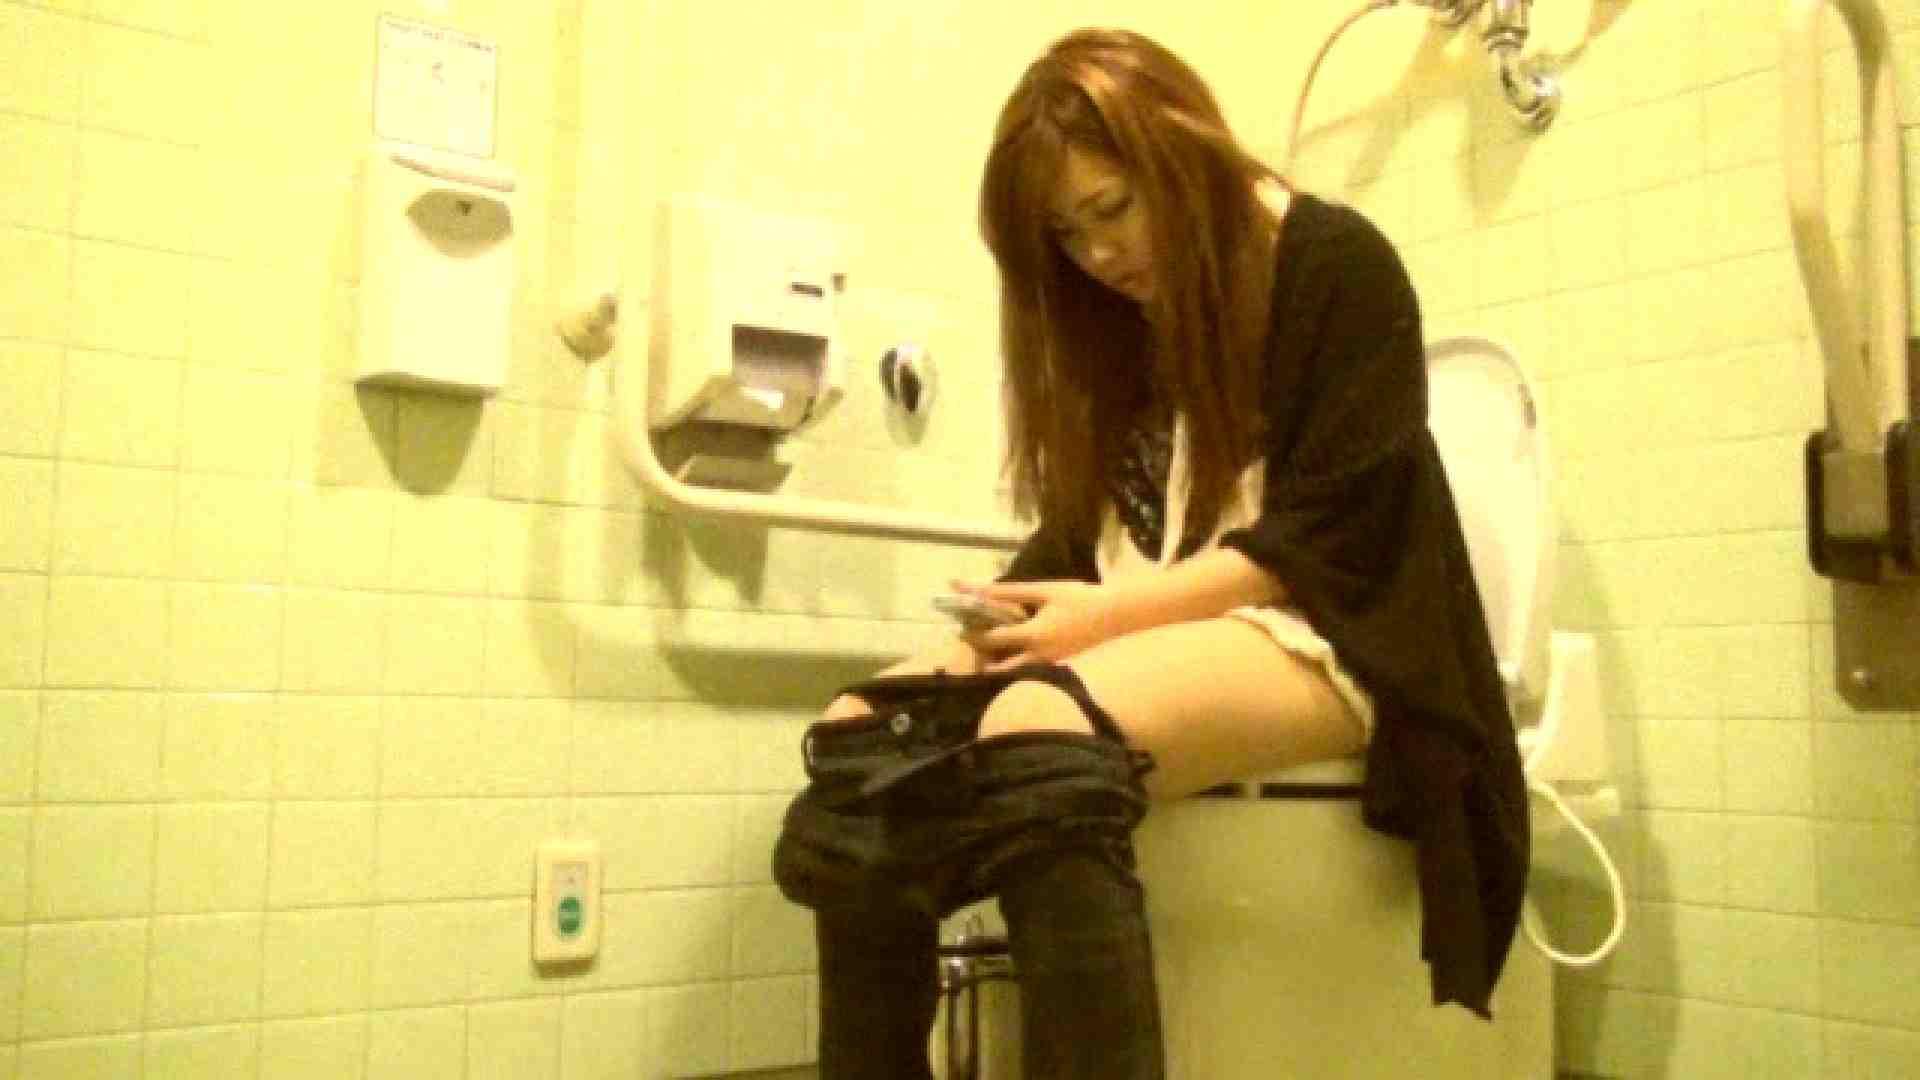 vol.26 【SKちゃん(洗面所)】ガールズバー店員 19歳 キャバ嬢  72PIX 23